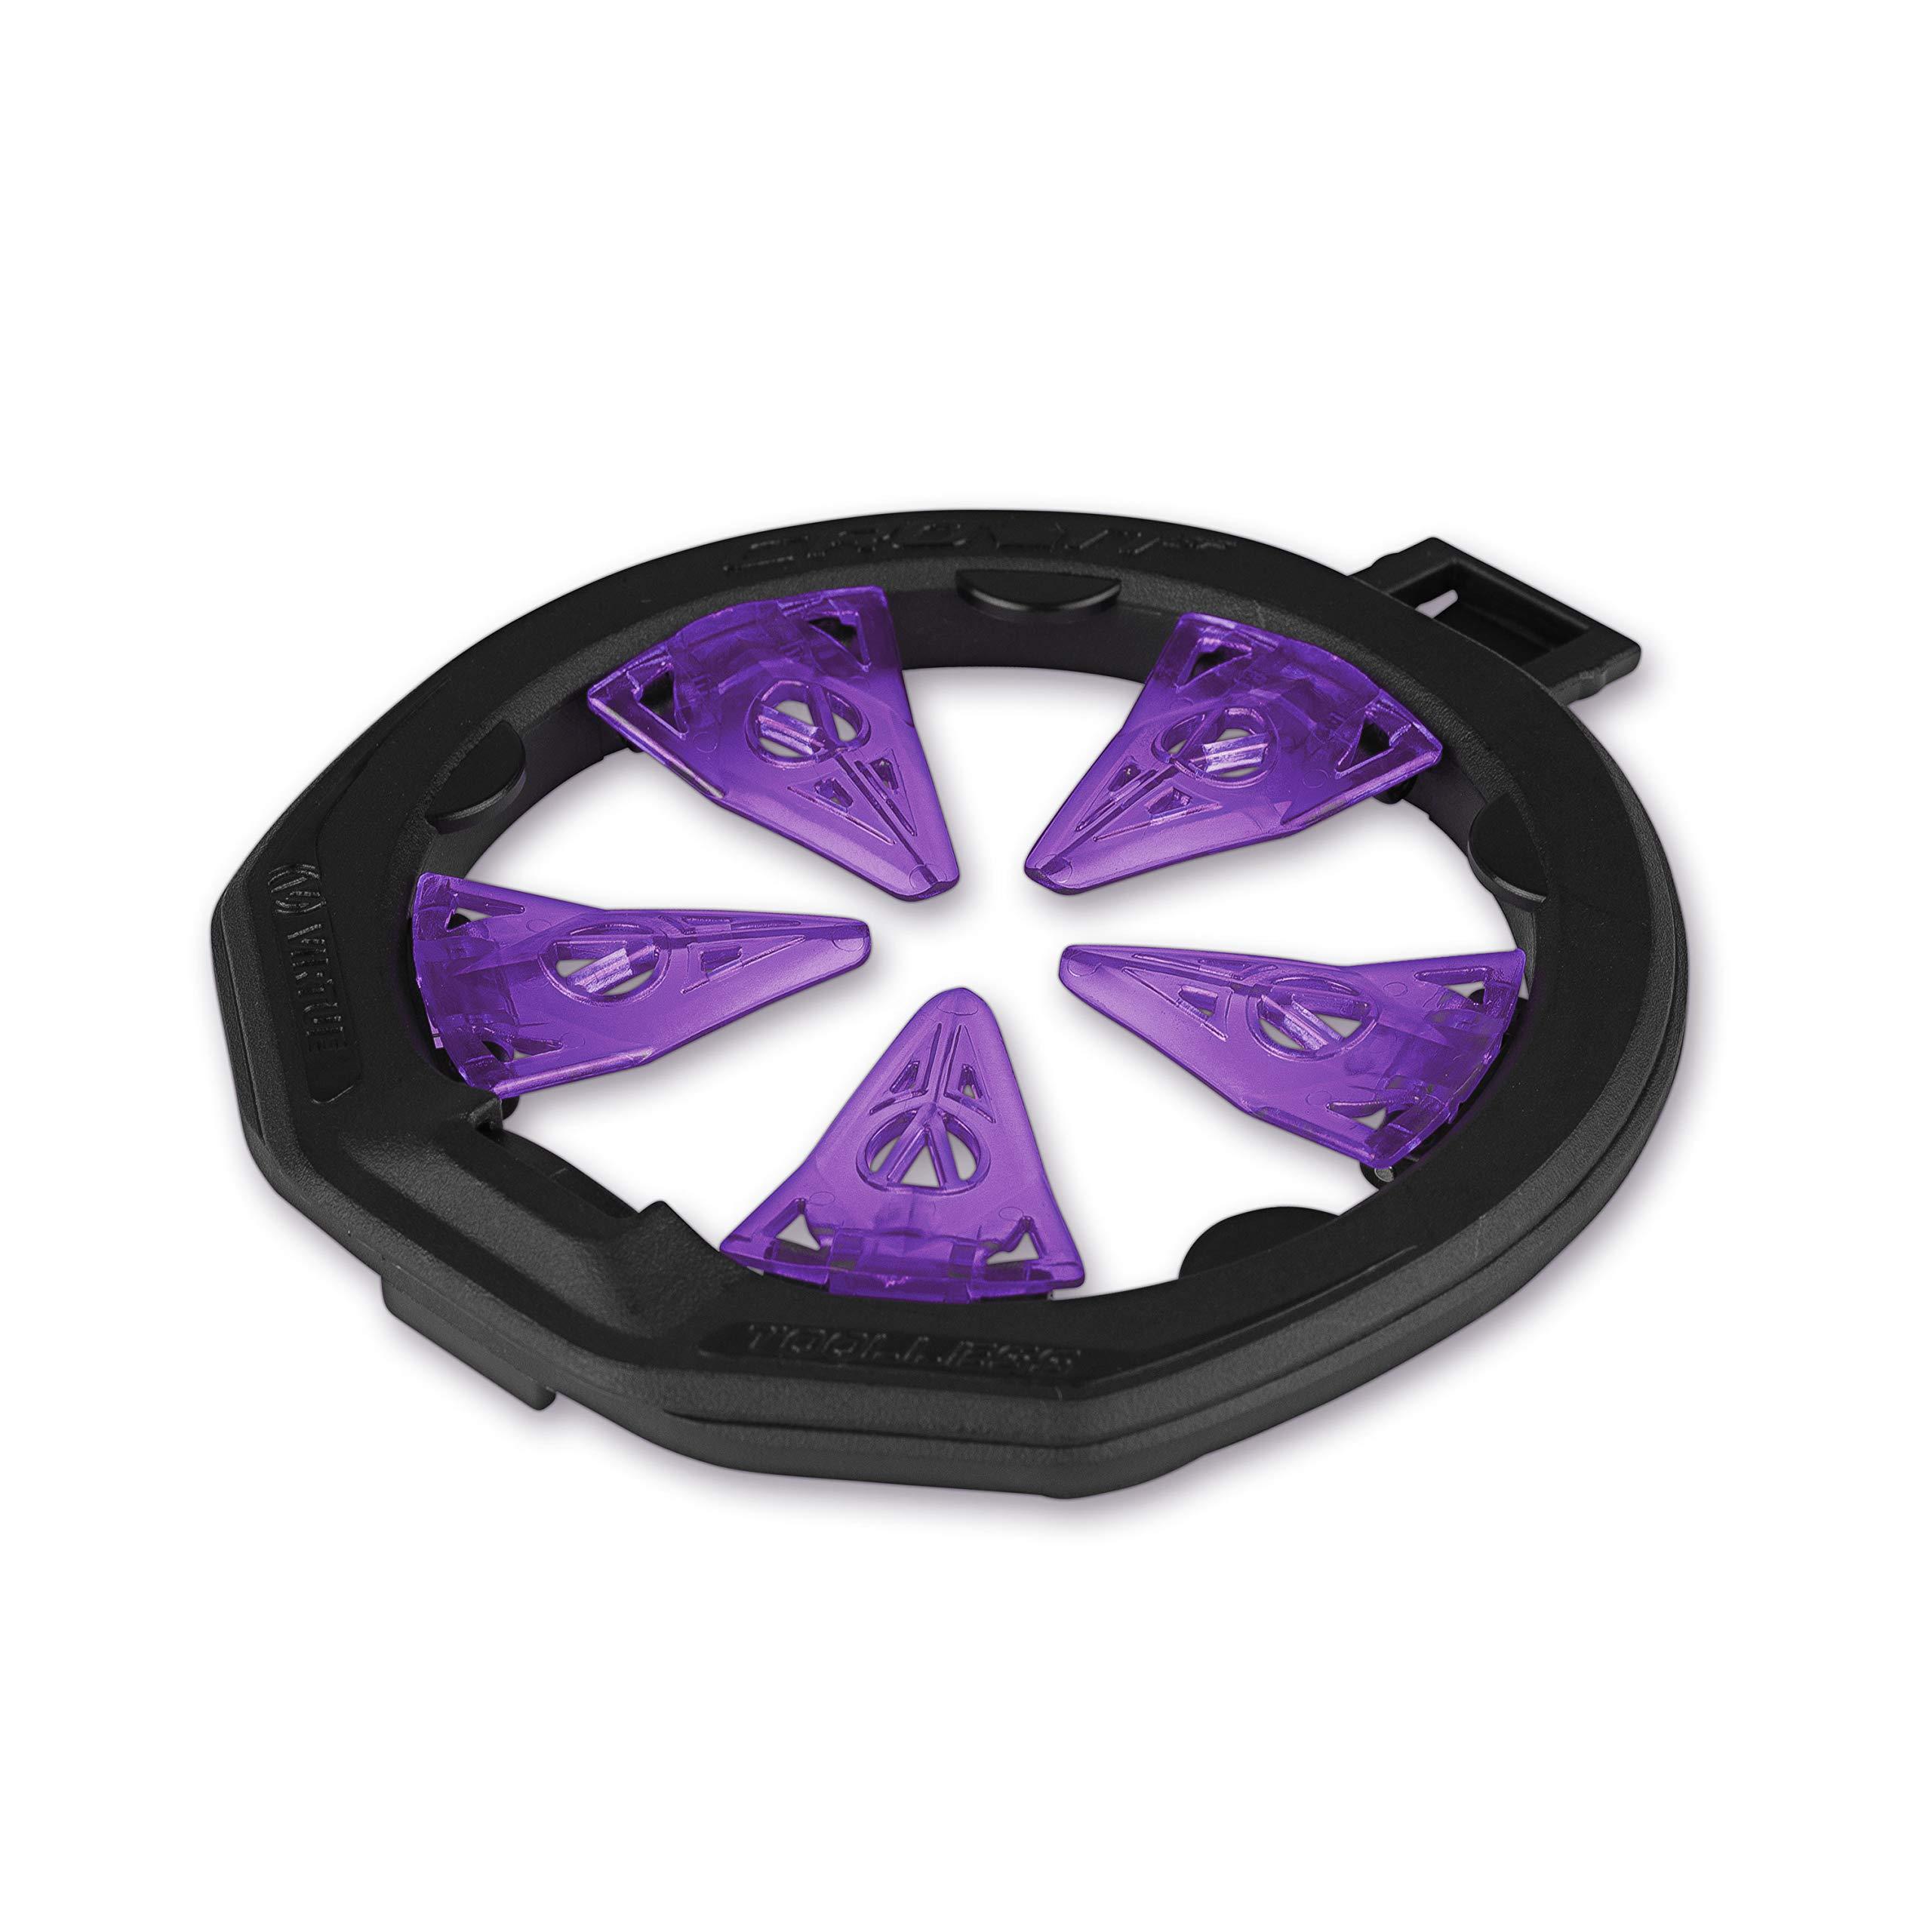 Virtue Paintball Spire III/280/IR CrownSF II Loader/Hopper Speedfeed - Purple by Virtue Paintball